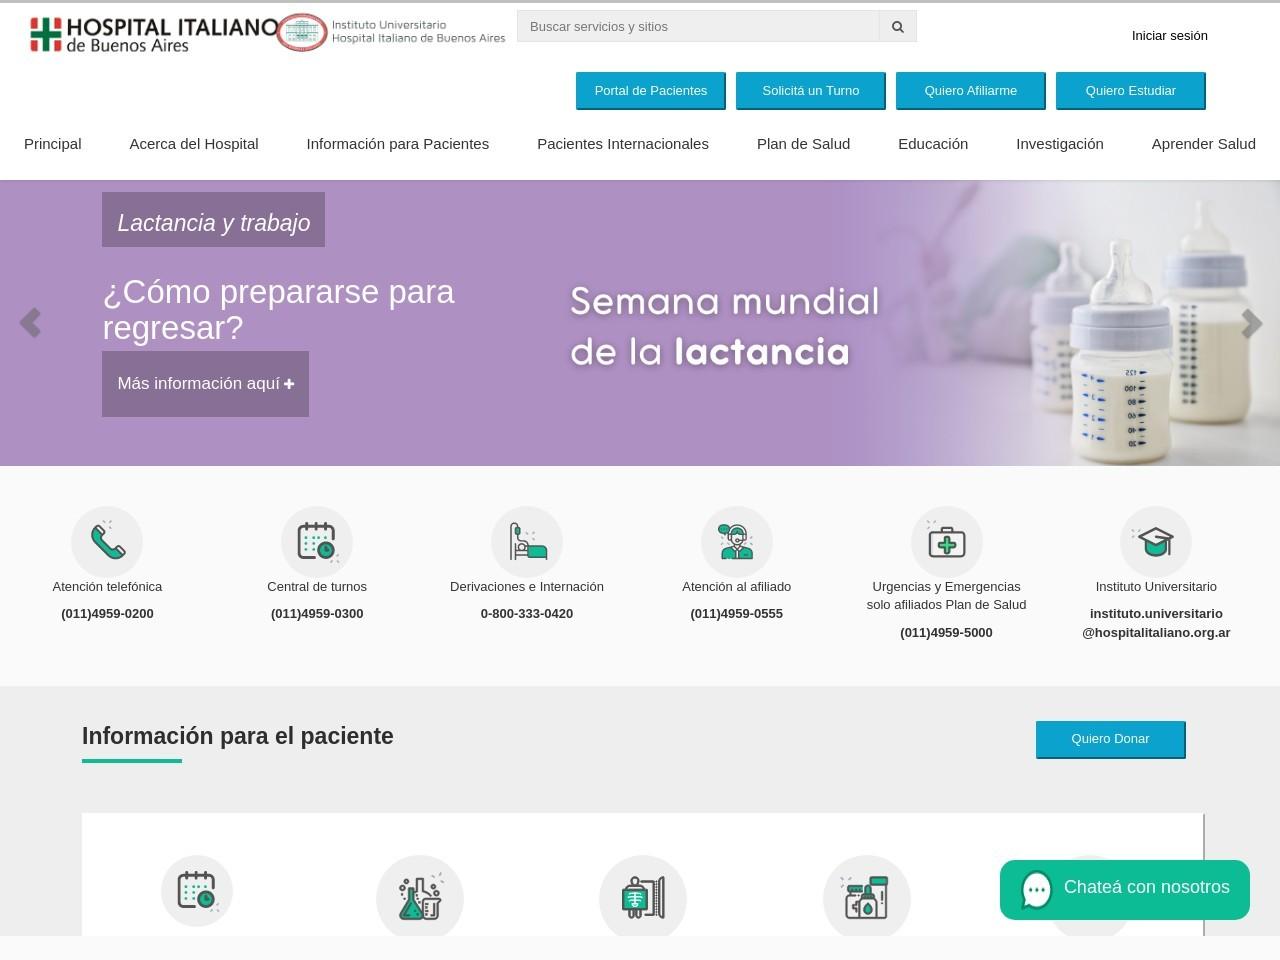 hospitalitaliano.org.ar